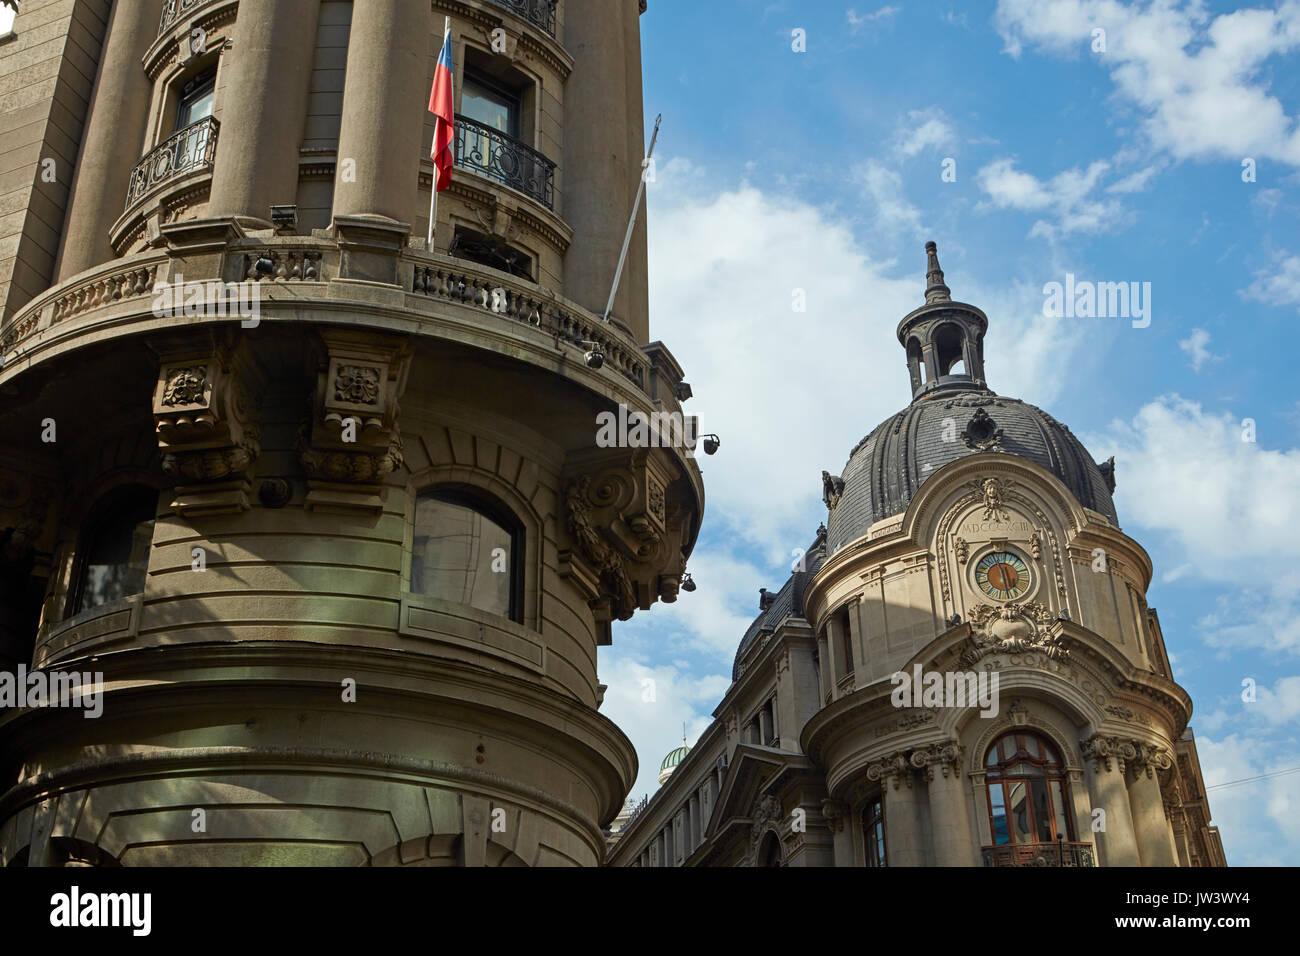 Ornate historic buidlings along La Bolsa, Santiago, Chile, South America - Stock Image